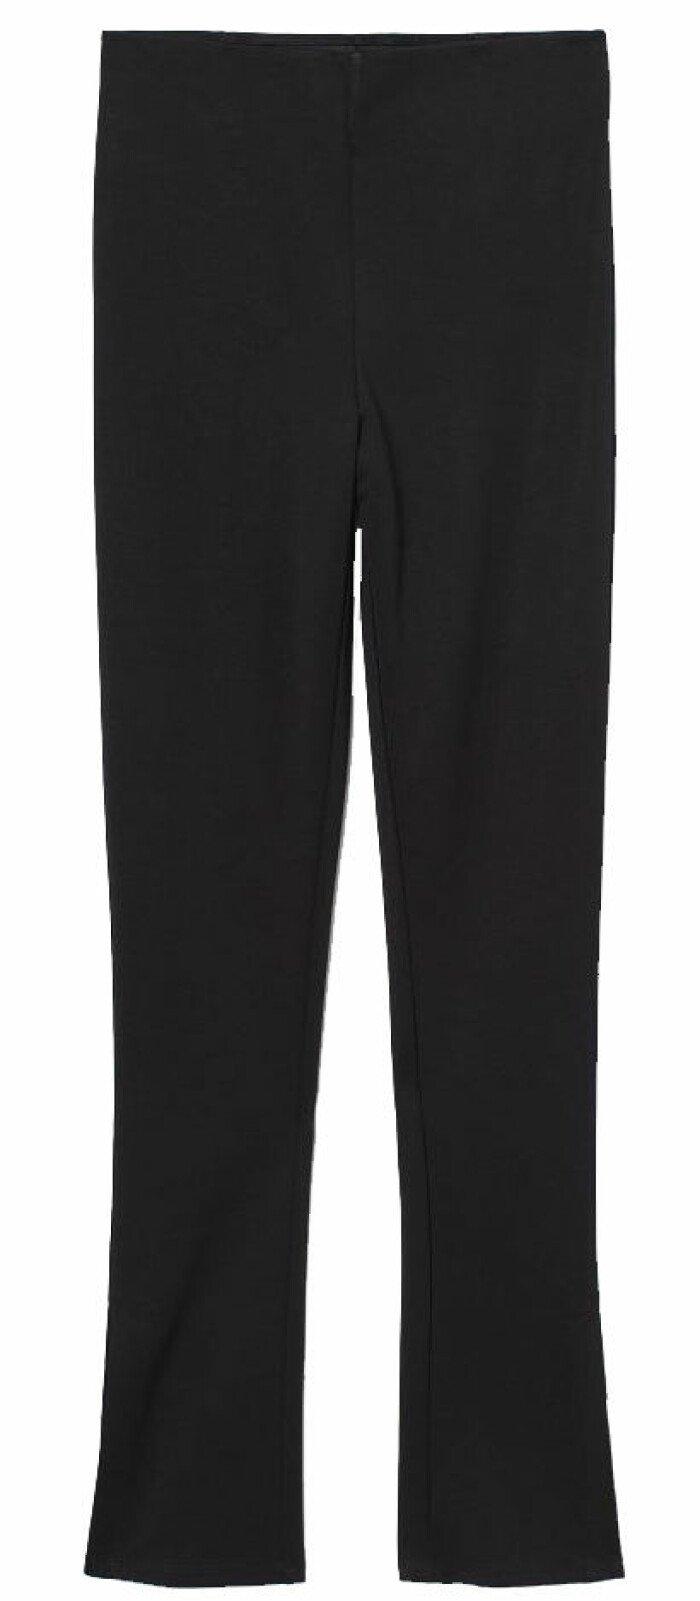 Leggings från H&M i svart med slits